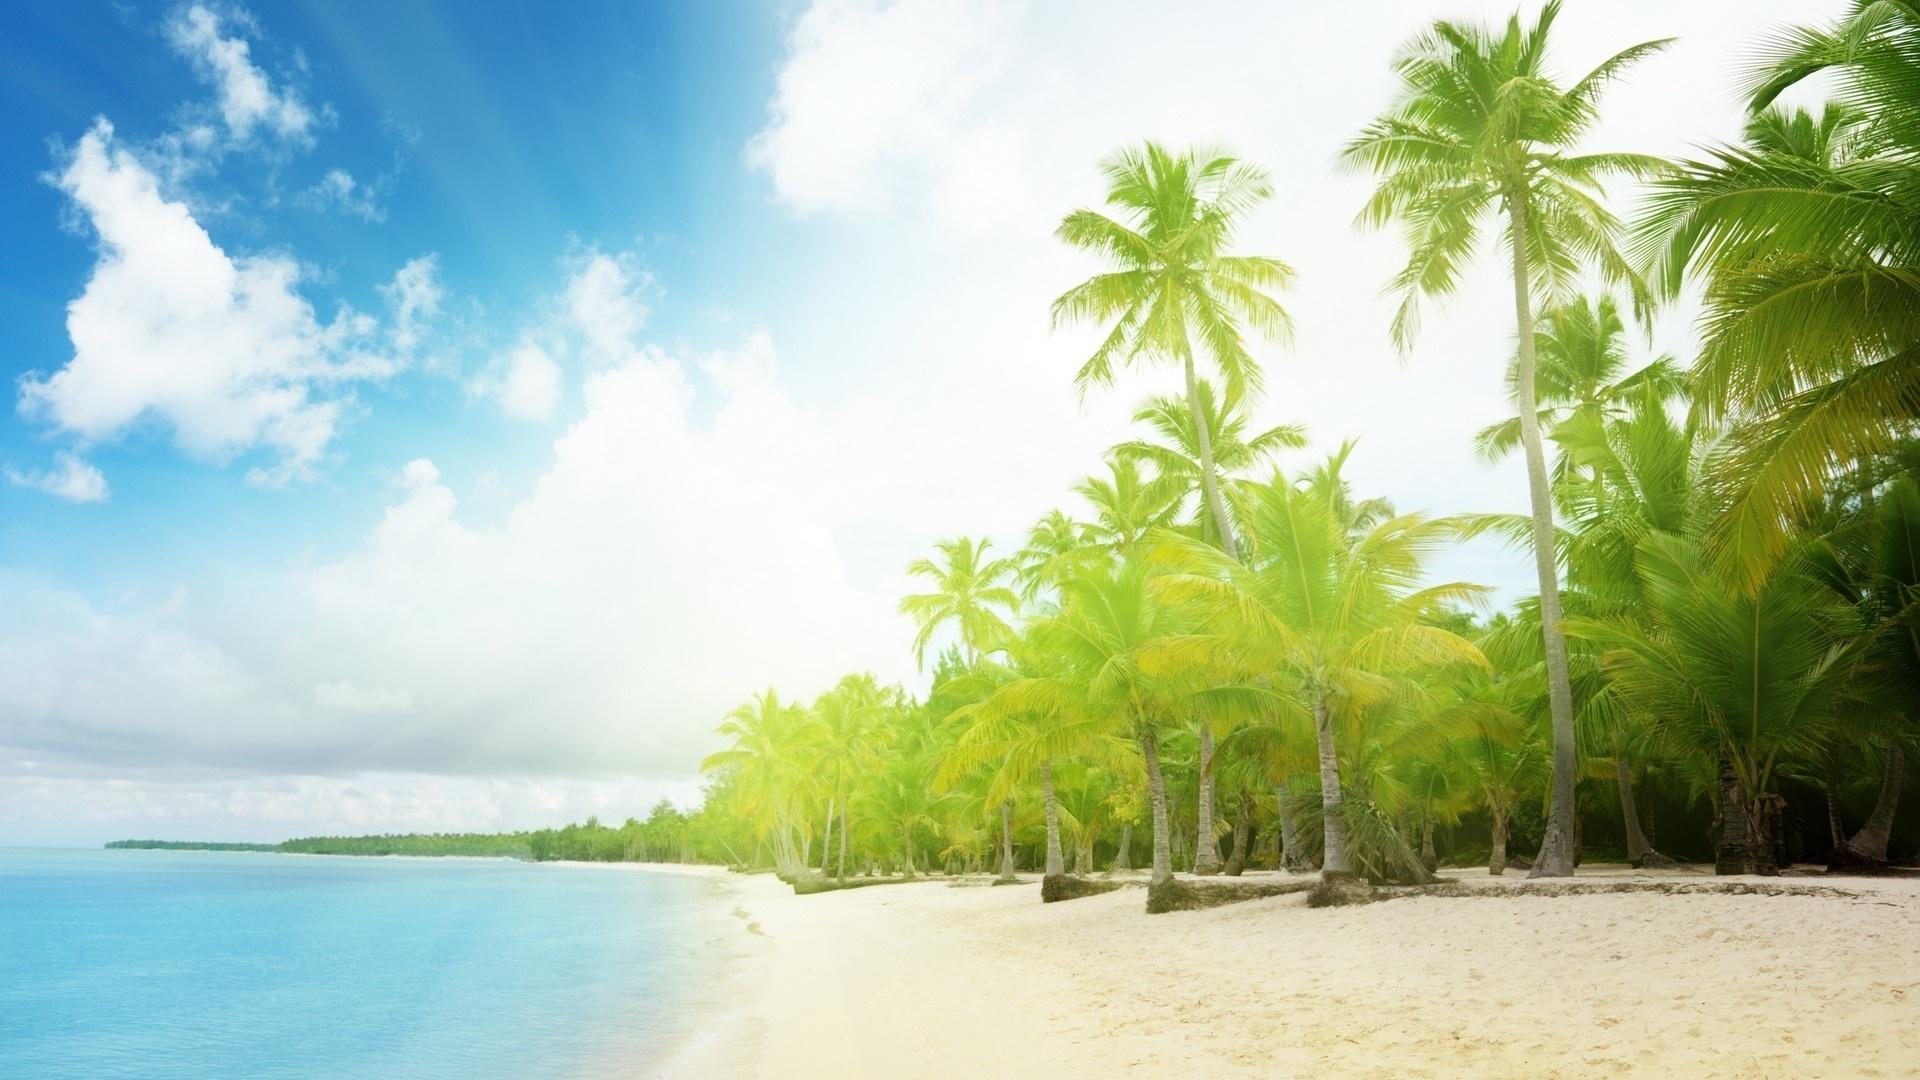 Пляж вода небо море остров лето